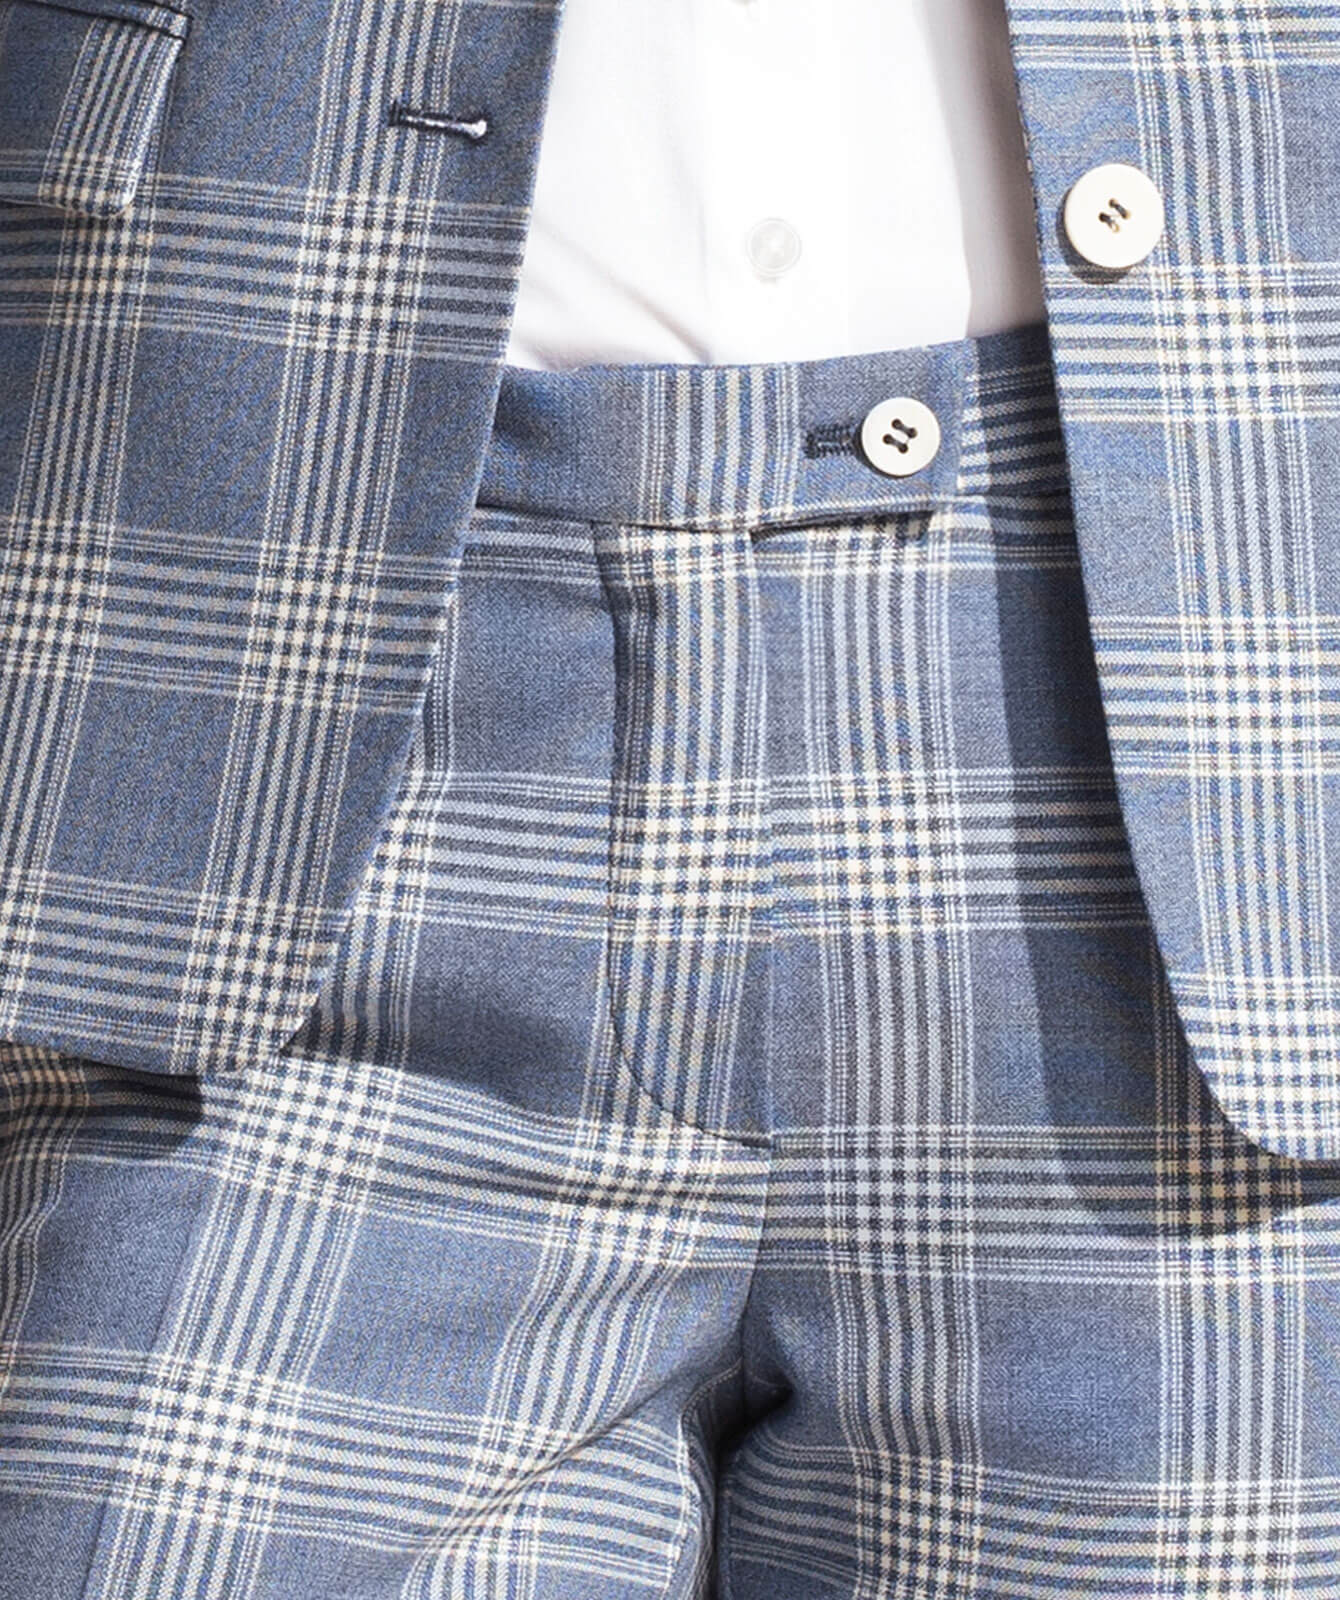 Softblauer Performance-Anzug